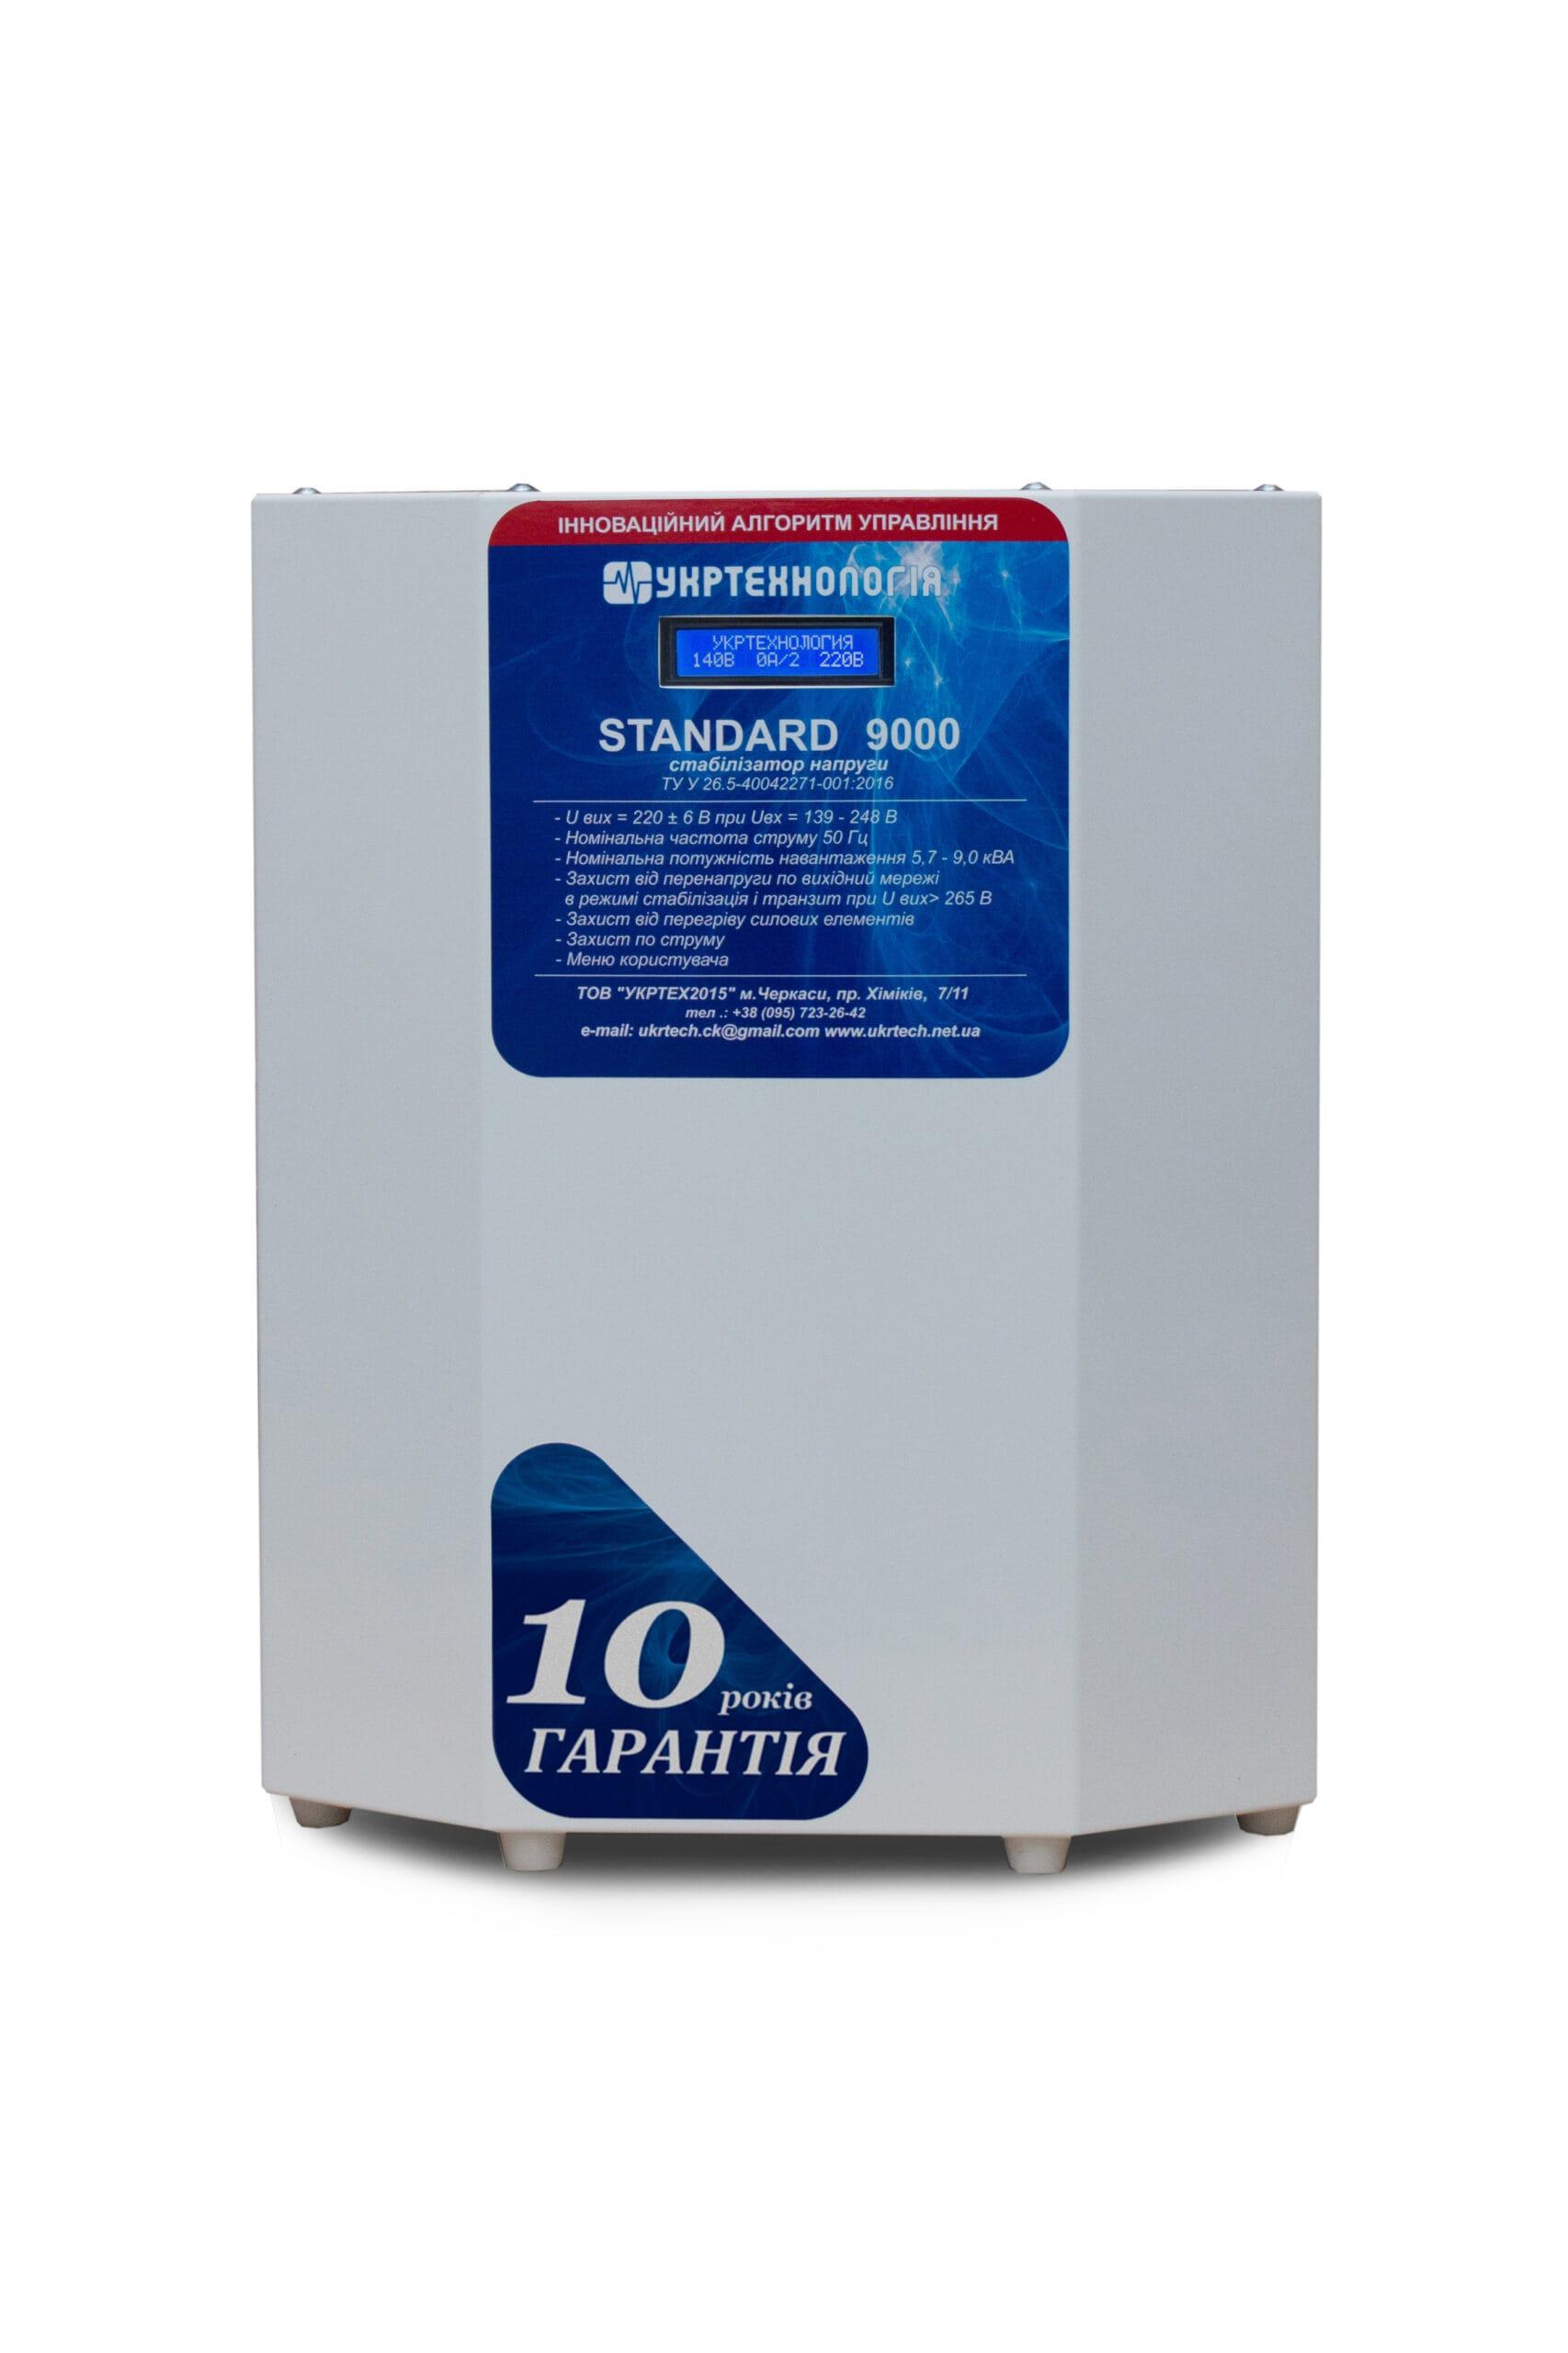 Стабилизаторы напряжения - Стабилизатор напряжения 9 кВт STANDARD 000001398 - Фото 2